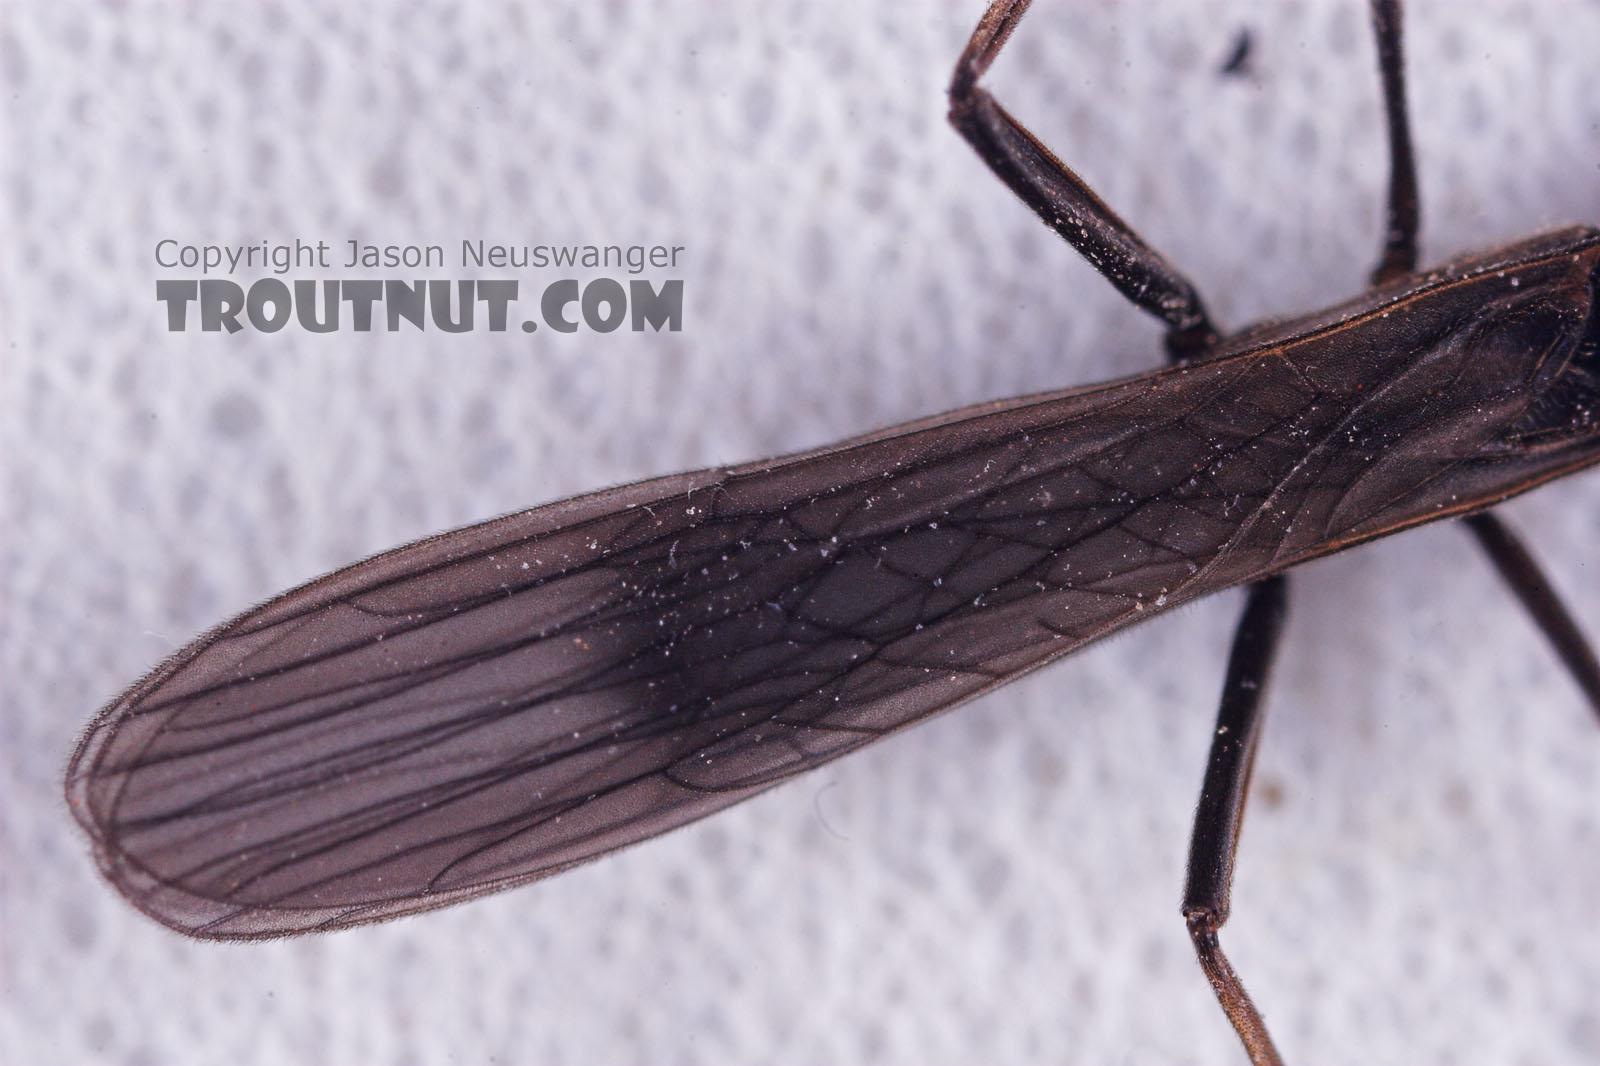 Capniidae (Snowflies) Stonefly Adult from Salmon Creek in New York